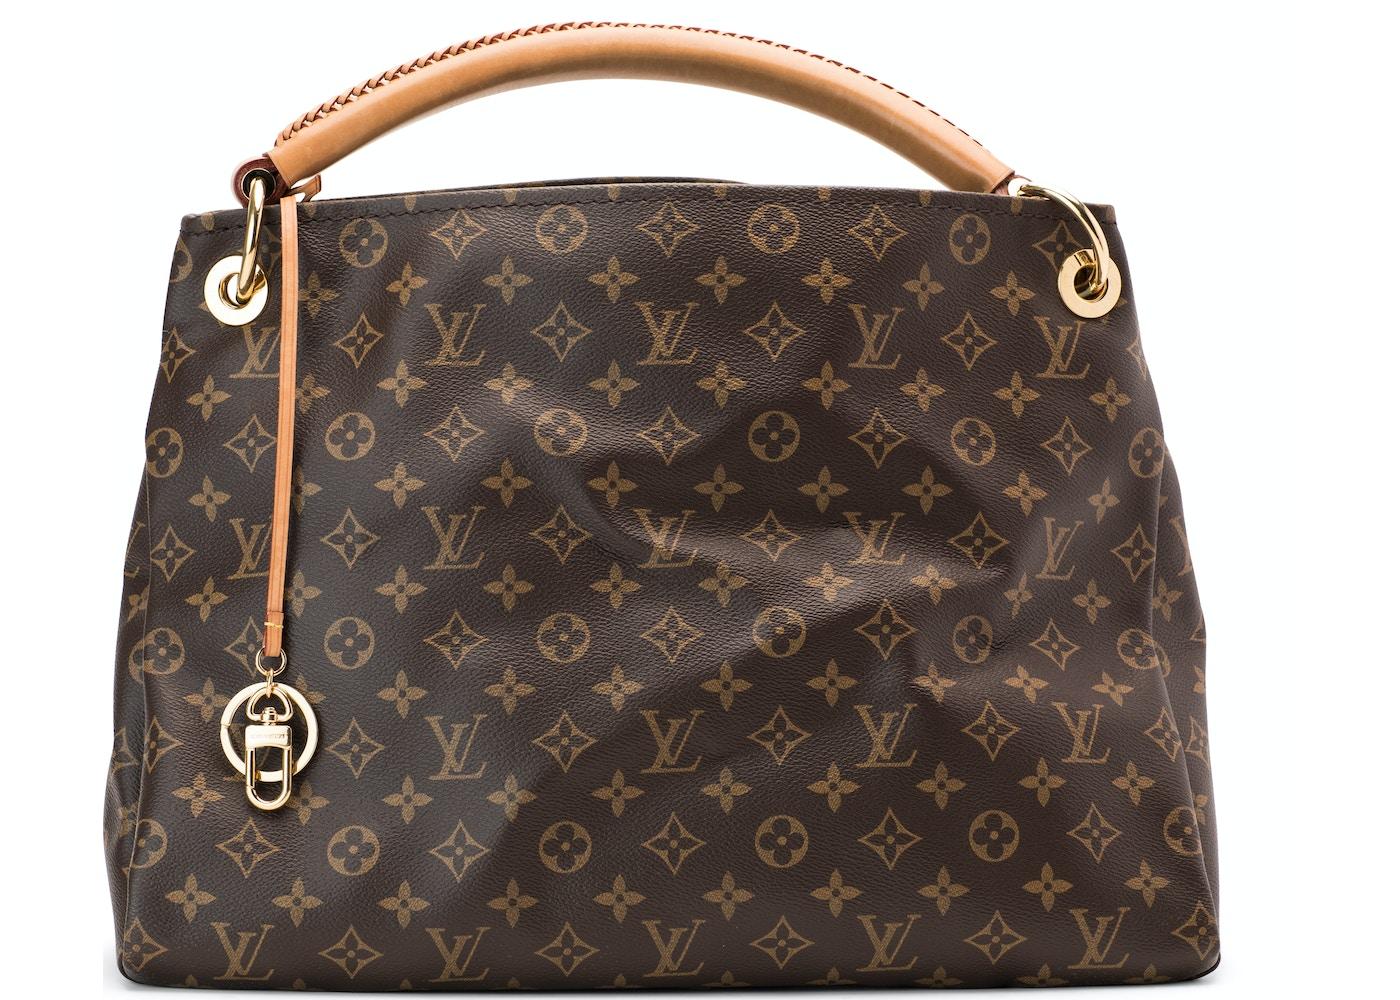 226427bc23 Louis Vuitton Artsy Monogram MM Brown. Monogram MM Brown